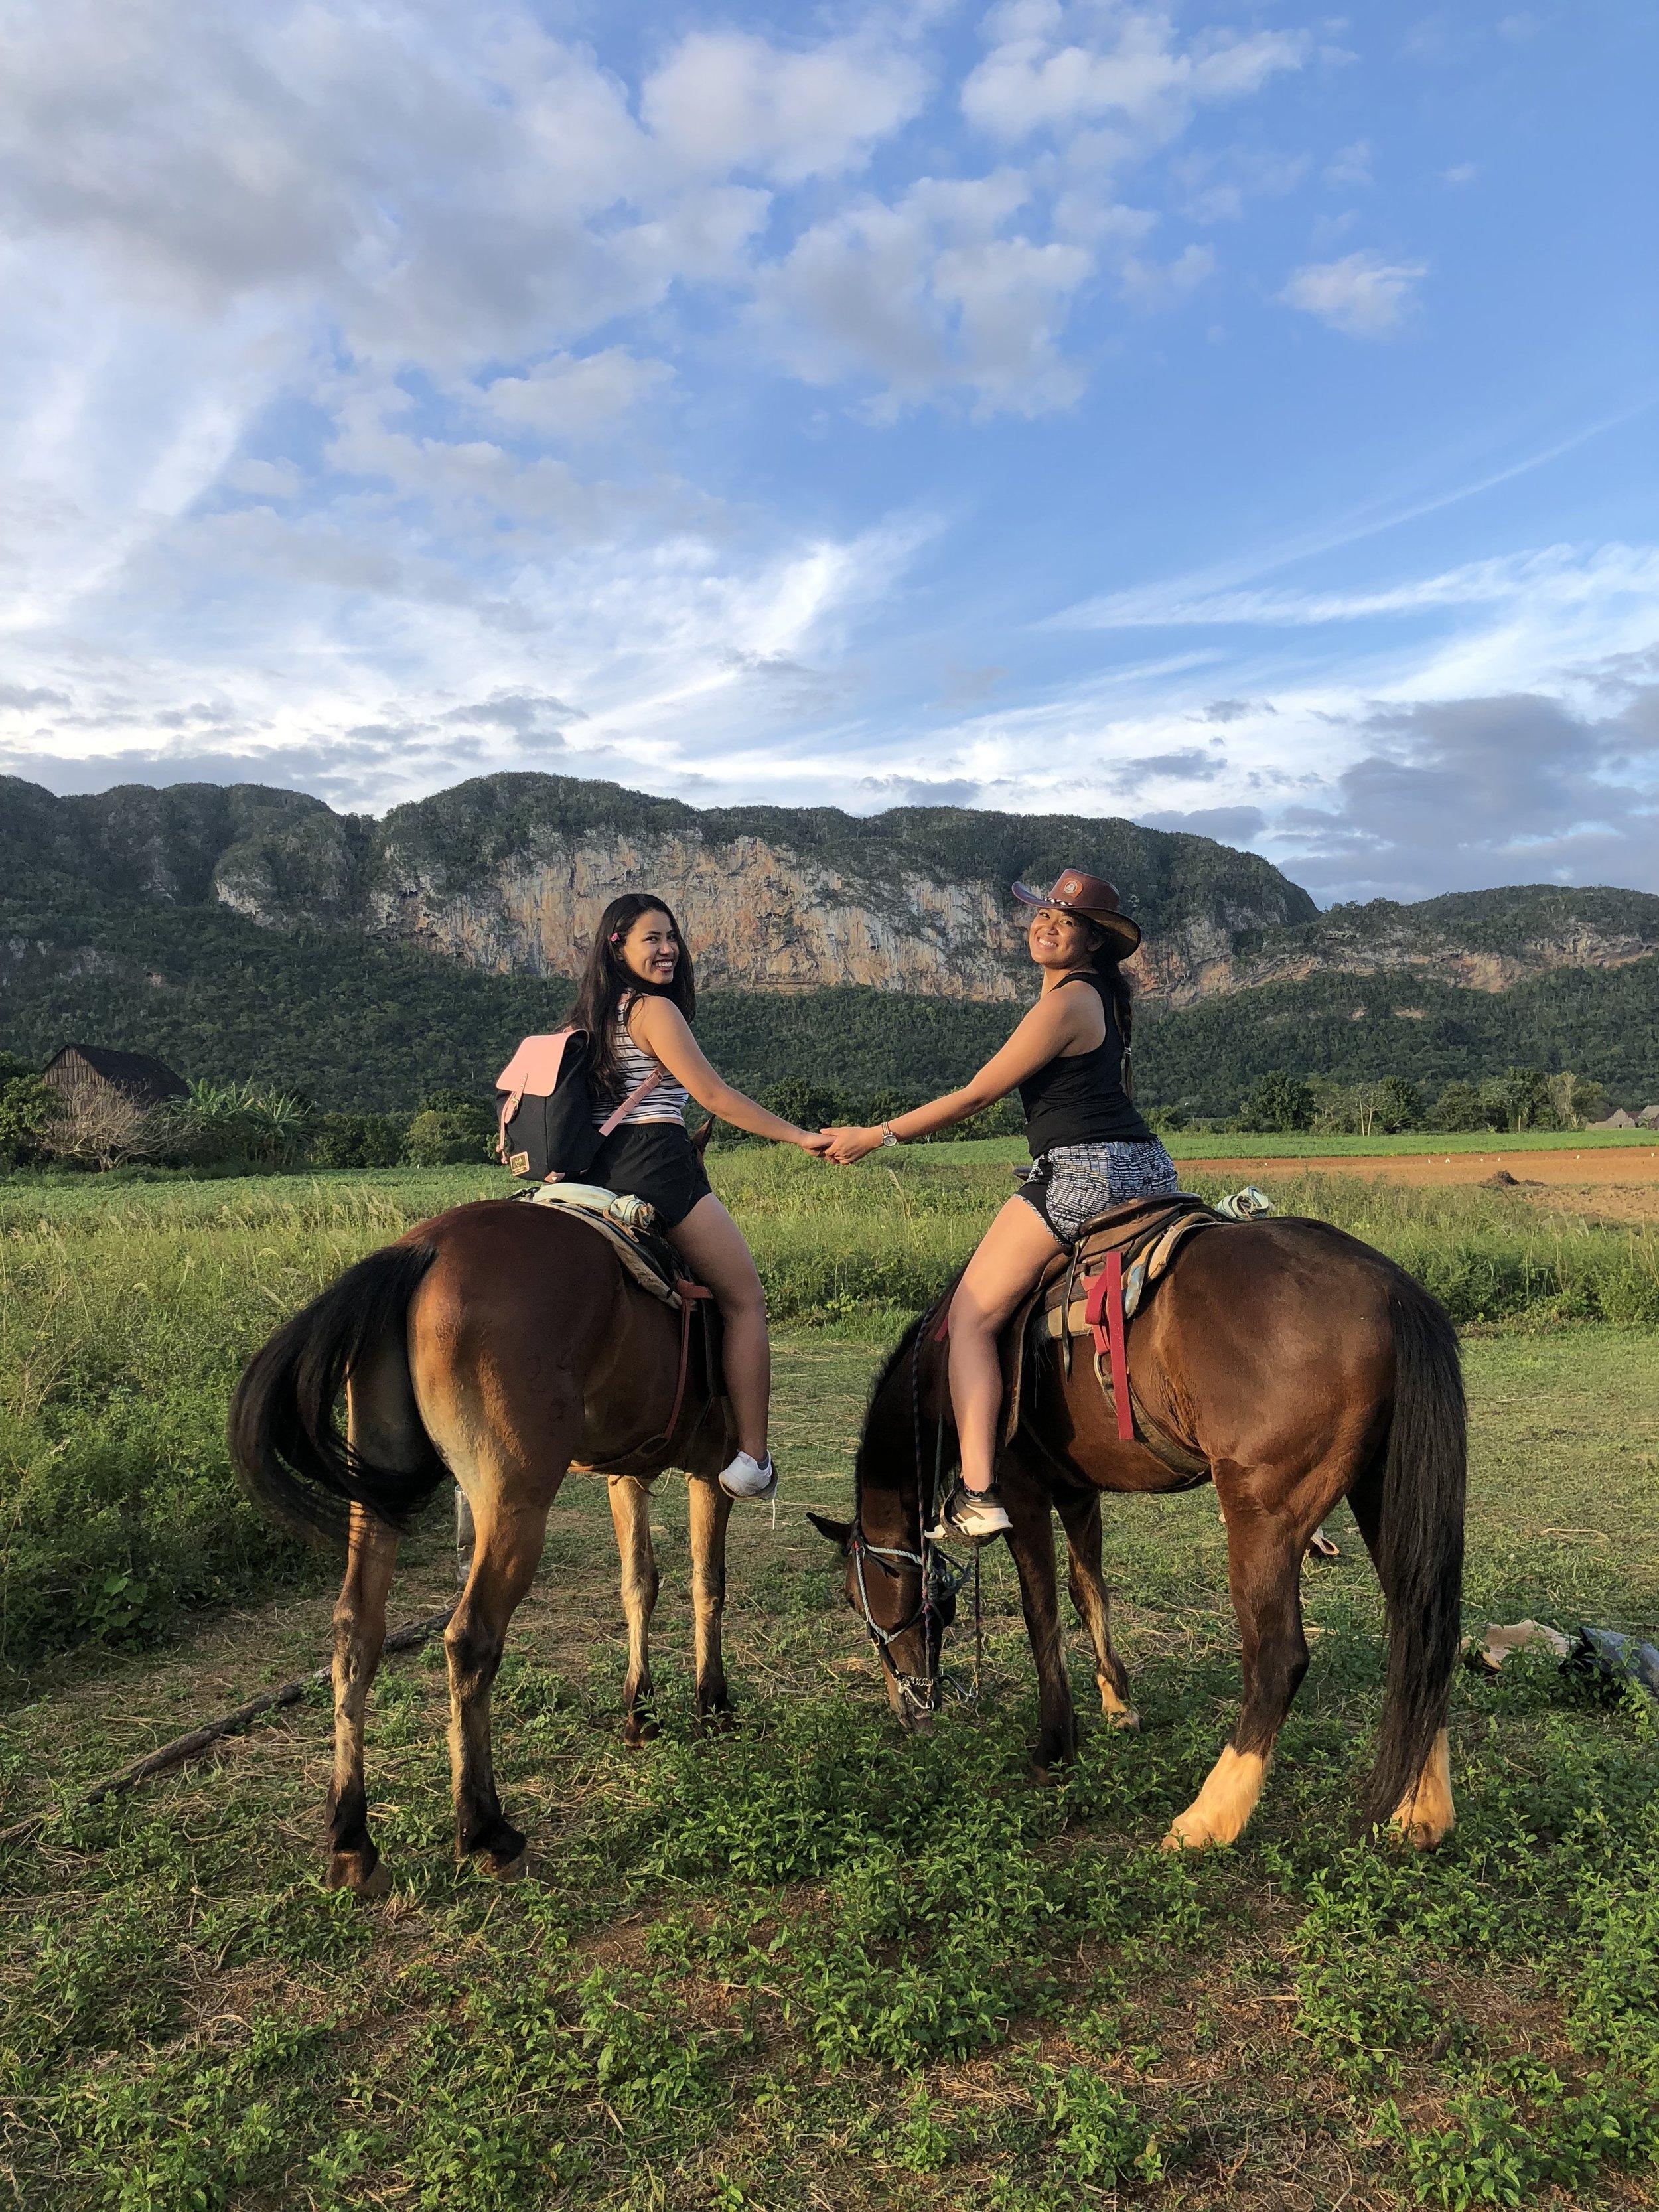 Our honeymoon part 2